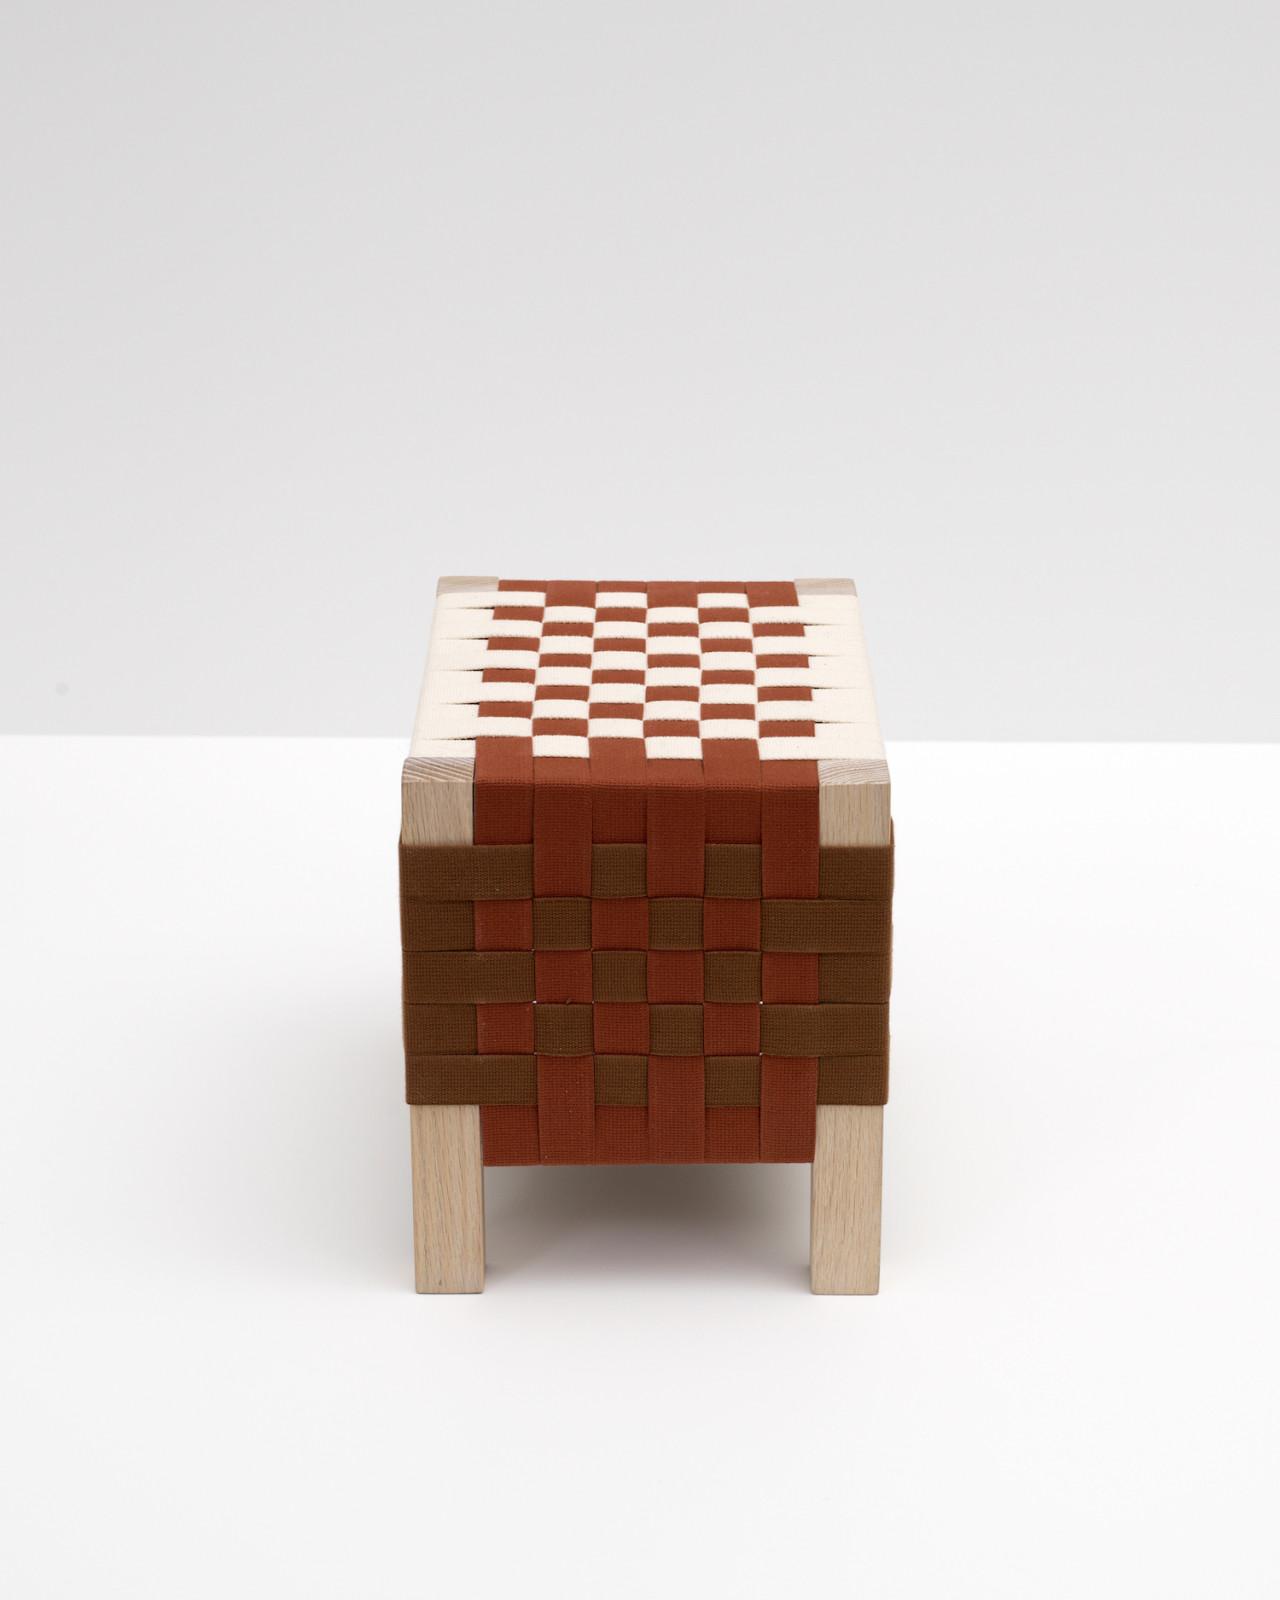 shakerdesignproject_hancockshakervillage_42